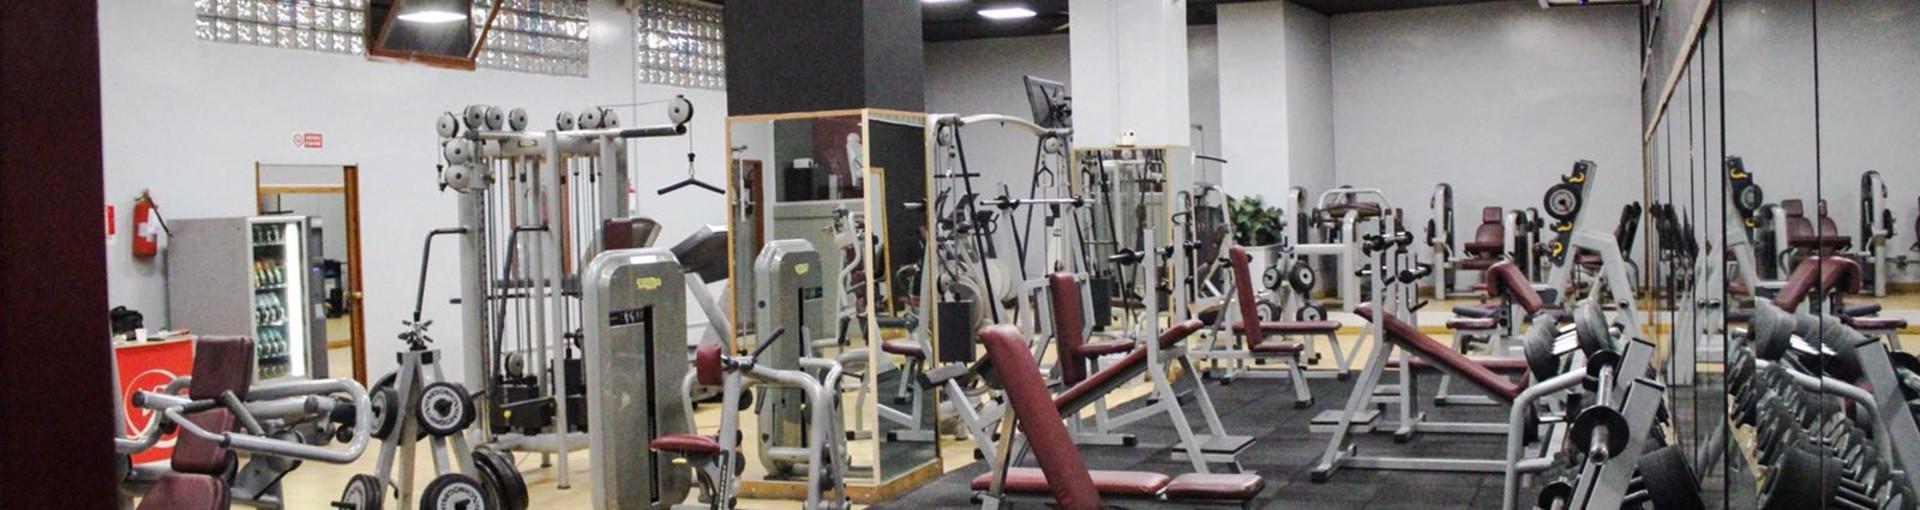 Venere Fitness Club - Napoli